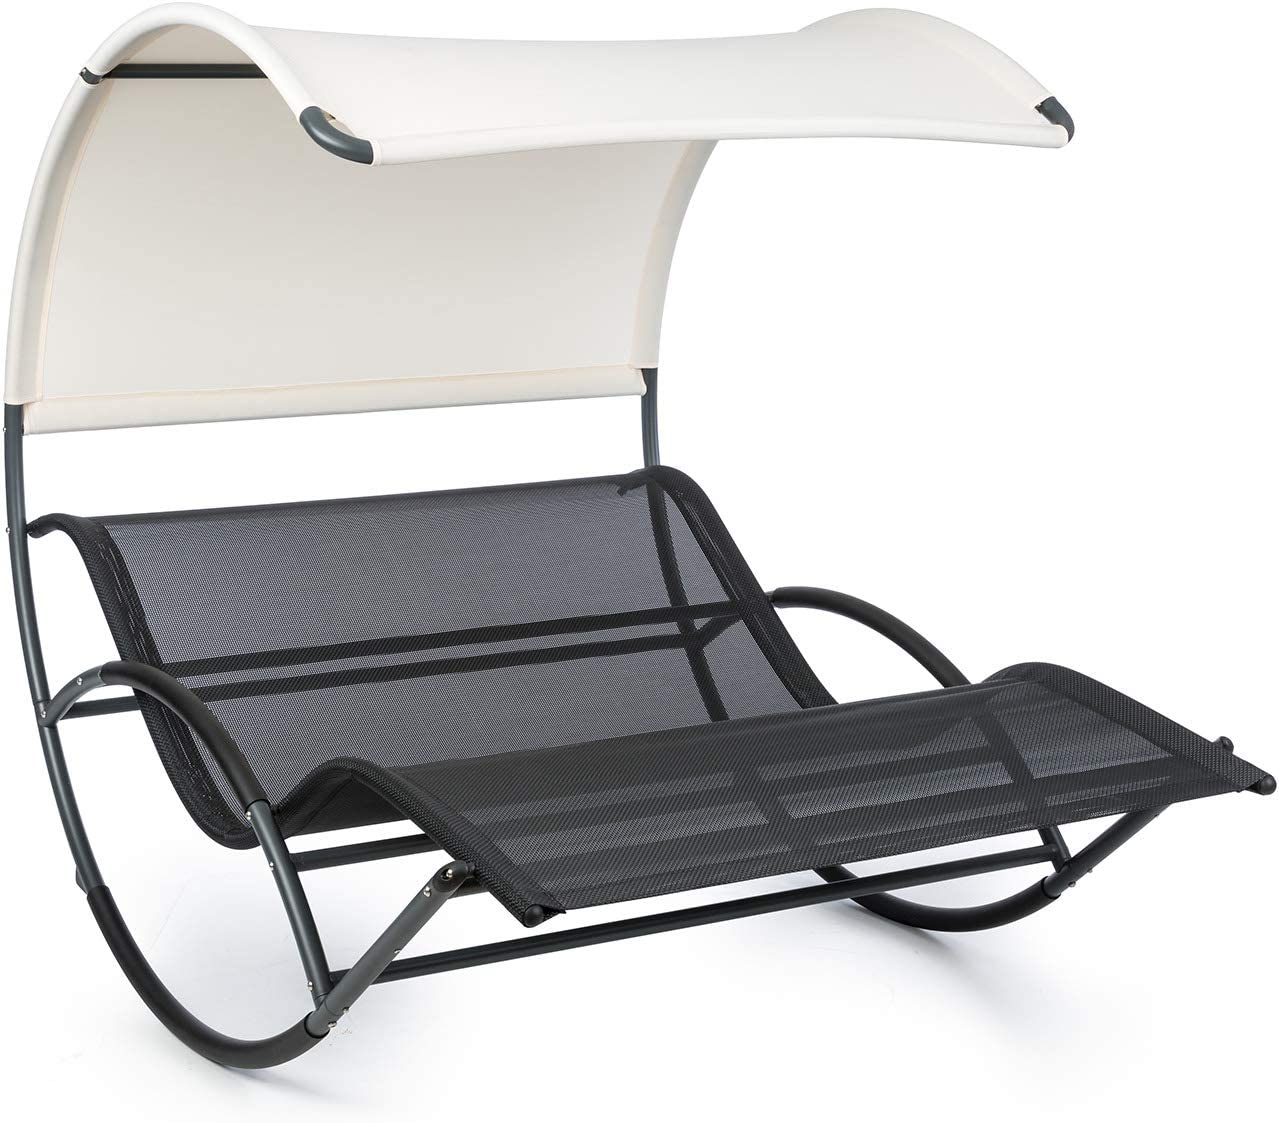 Blumfeldt The Big Easy - Tumbona techada, Mecedora ergonómica, Uso Recomendado Exteriores, Impermeable, Protección Rayos UV, Estructura de Acero, Peso máx. soportado 350 Kg, Negro